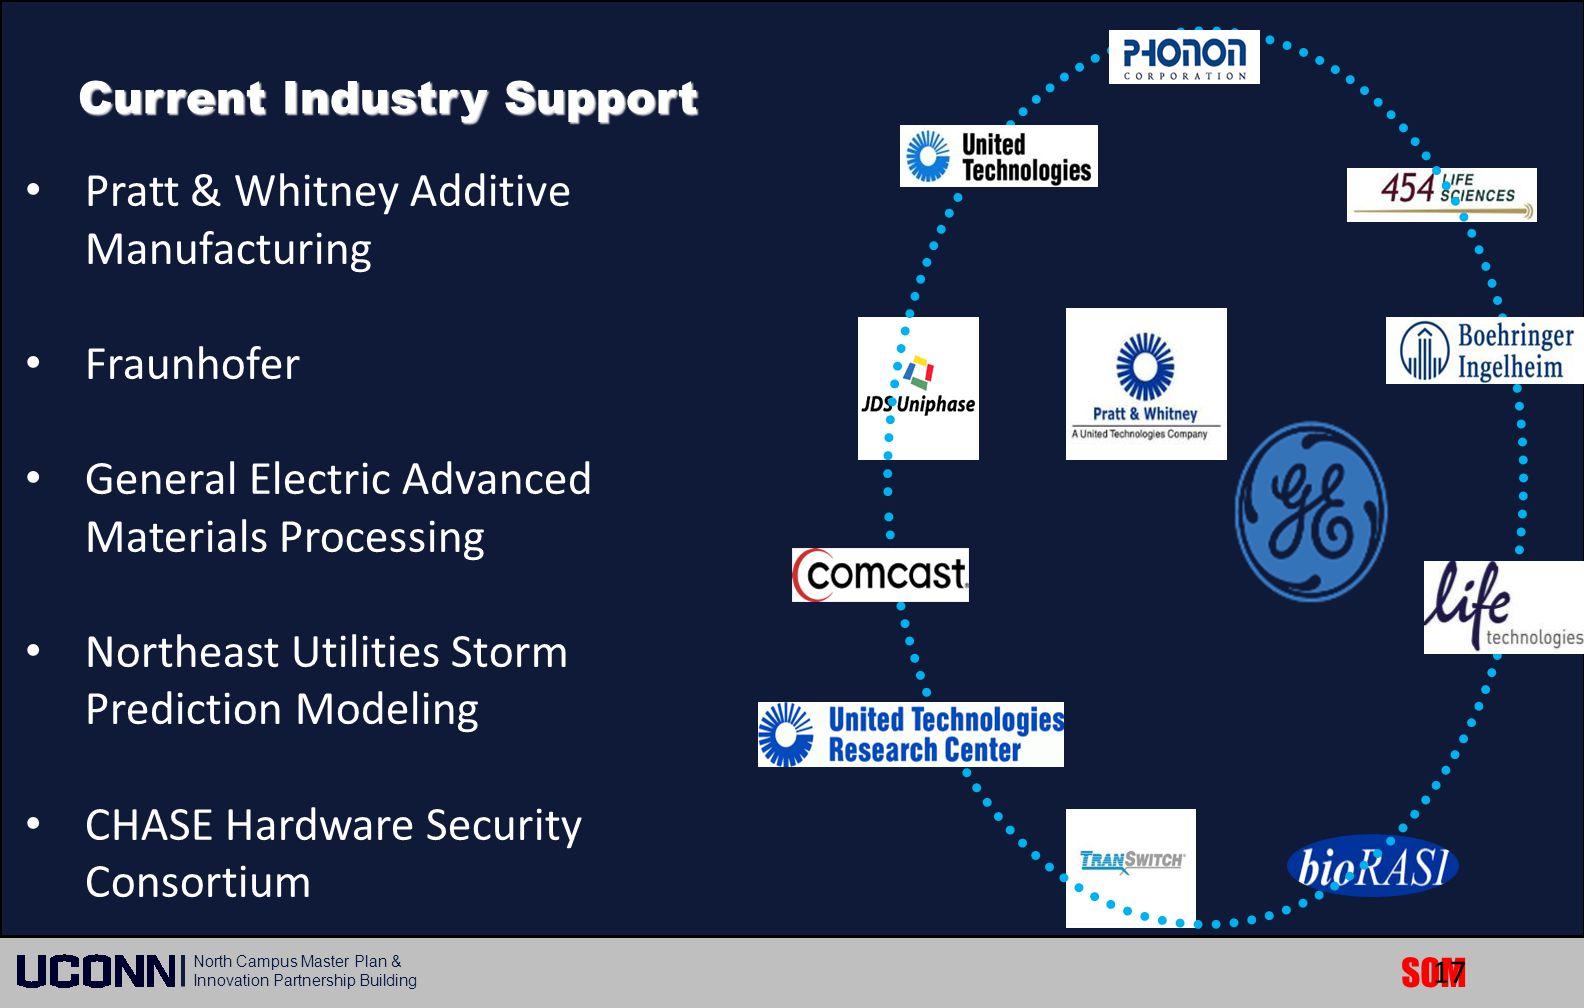 Pratt & Whitney Additive Manufacturing